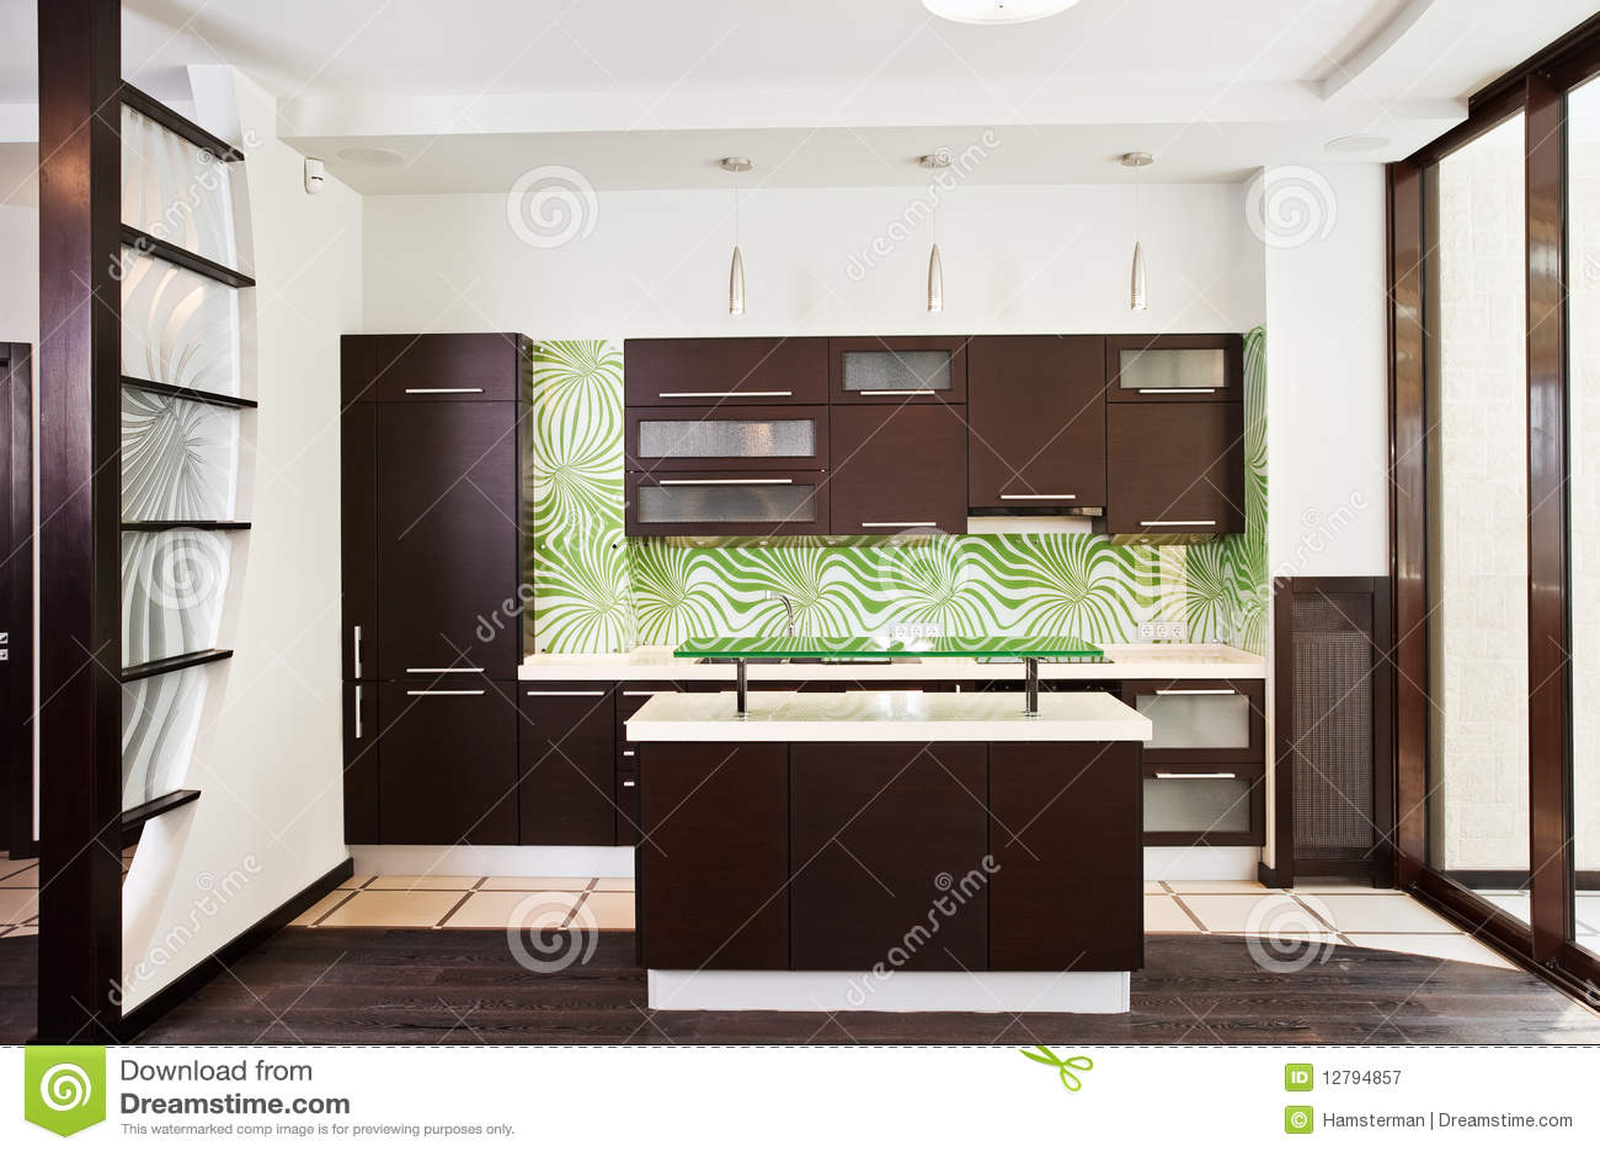 Modern Kitchen Interiors Modern Kitchen Interior With Dark Wooden Floor Royalty Free Stock